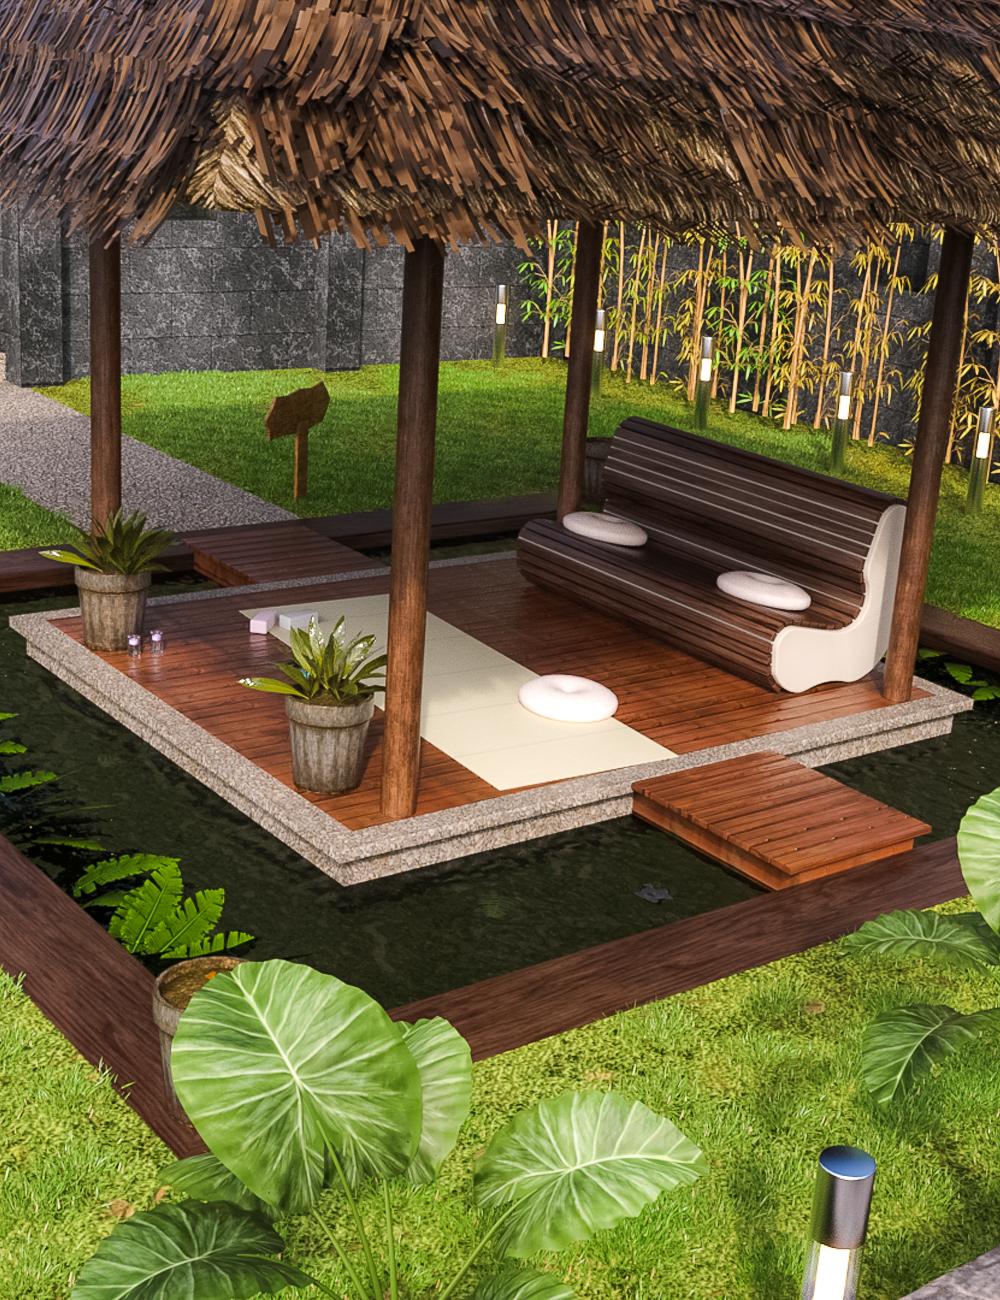 Meditation Pavilion by: clacydarch3d, 3D Models by Daz 3D